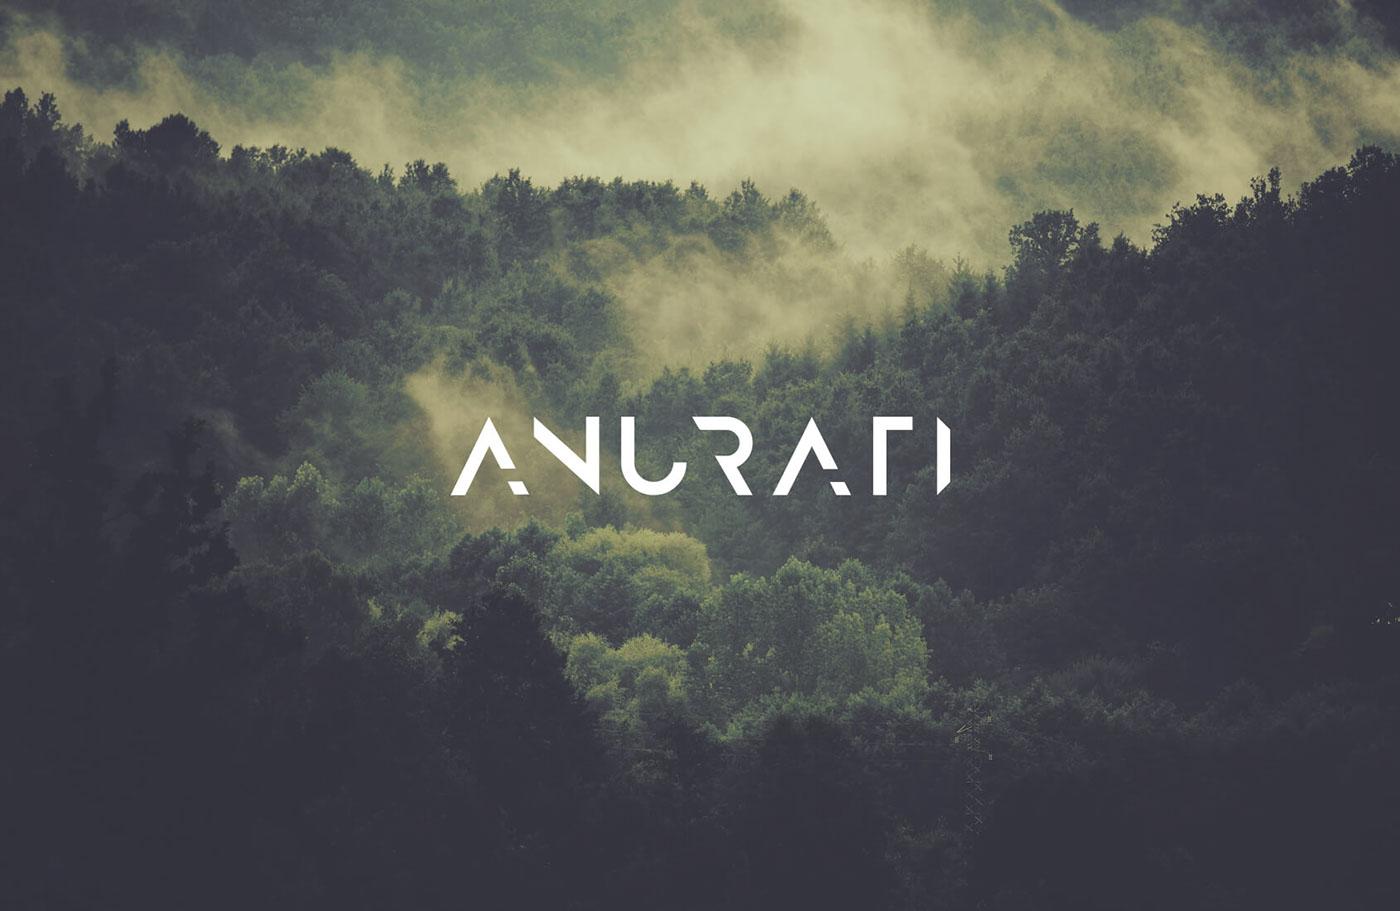 Best free fonts: Anurati